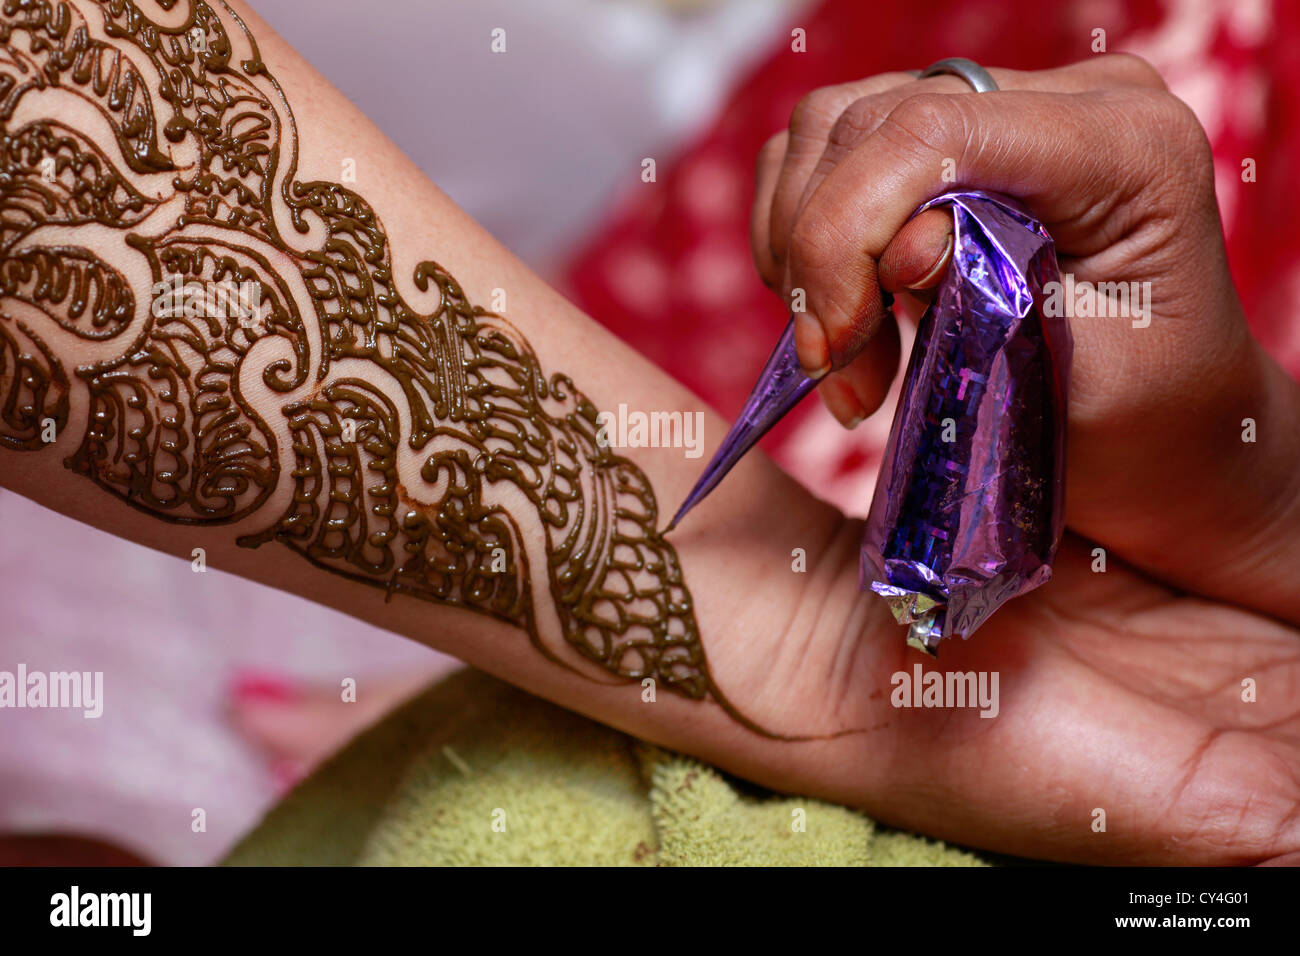 Henna Tattoo Thailand : Henna tattoo stock photos images alamy